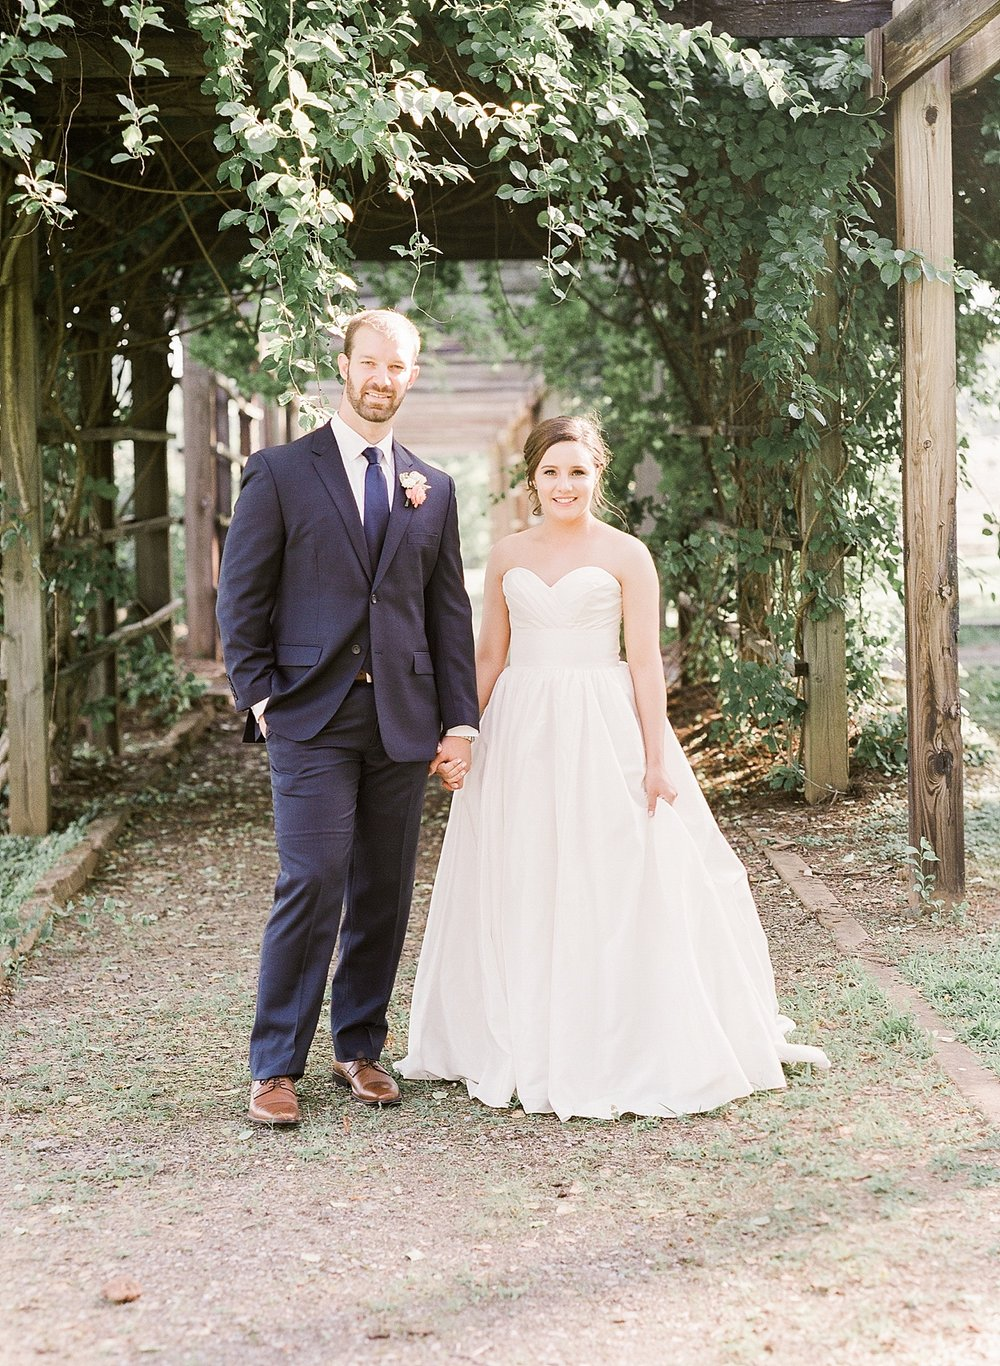 Kimberly Florence Photography_Charlottesville Wedding Photographer_NYC Wedding Photographer_Oak Ridge Estate Wedding_0026.jpg